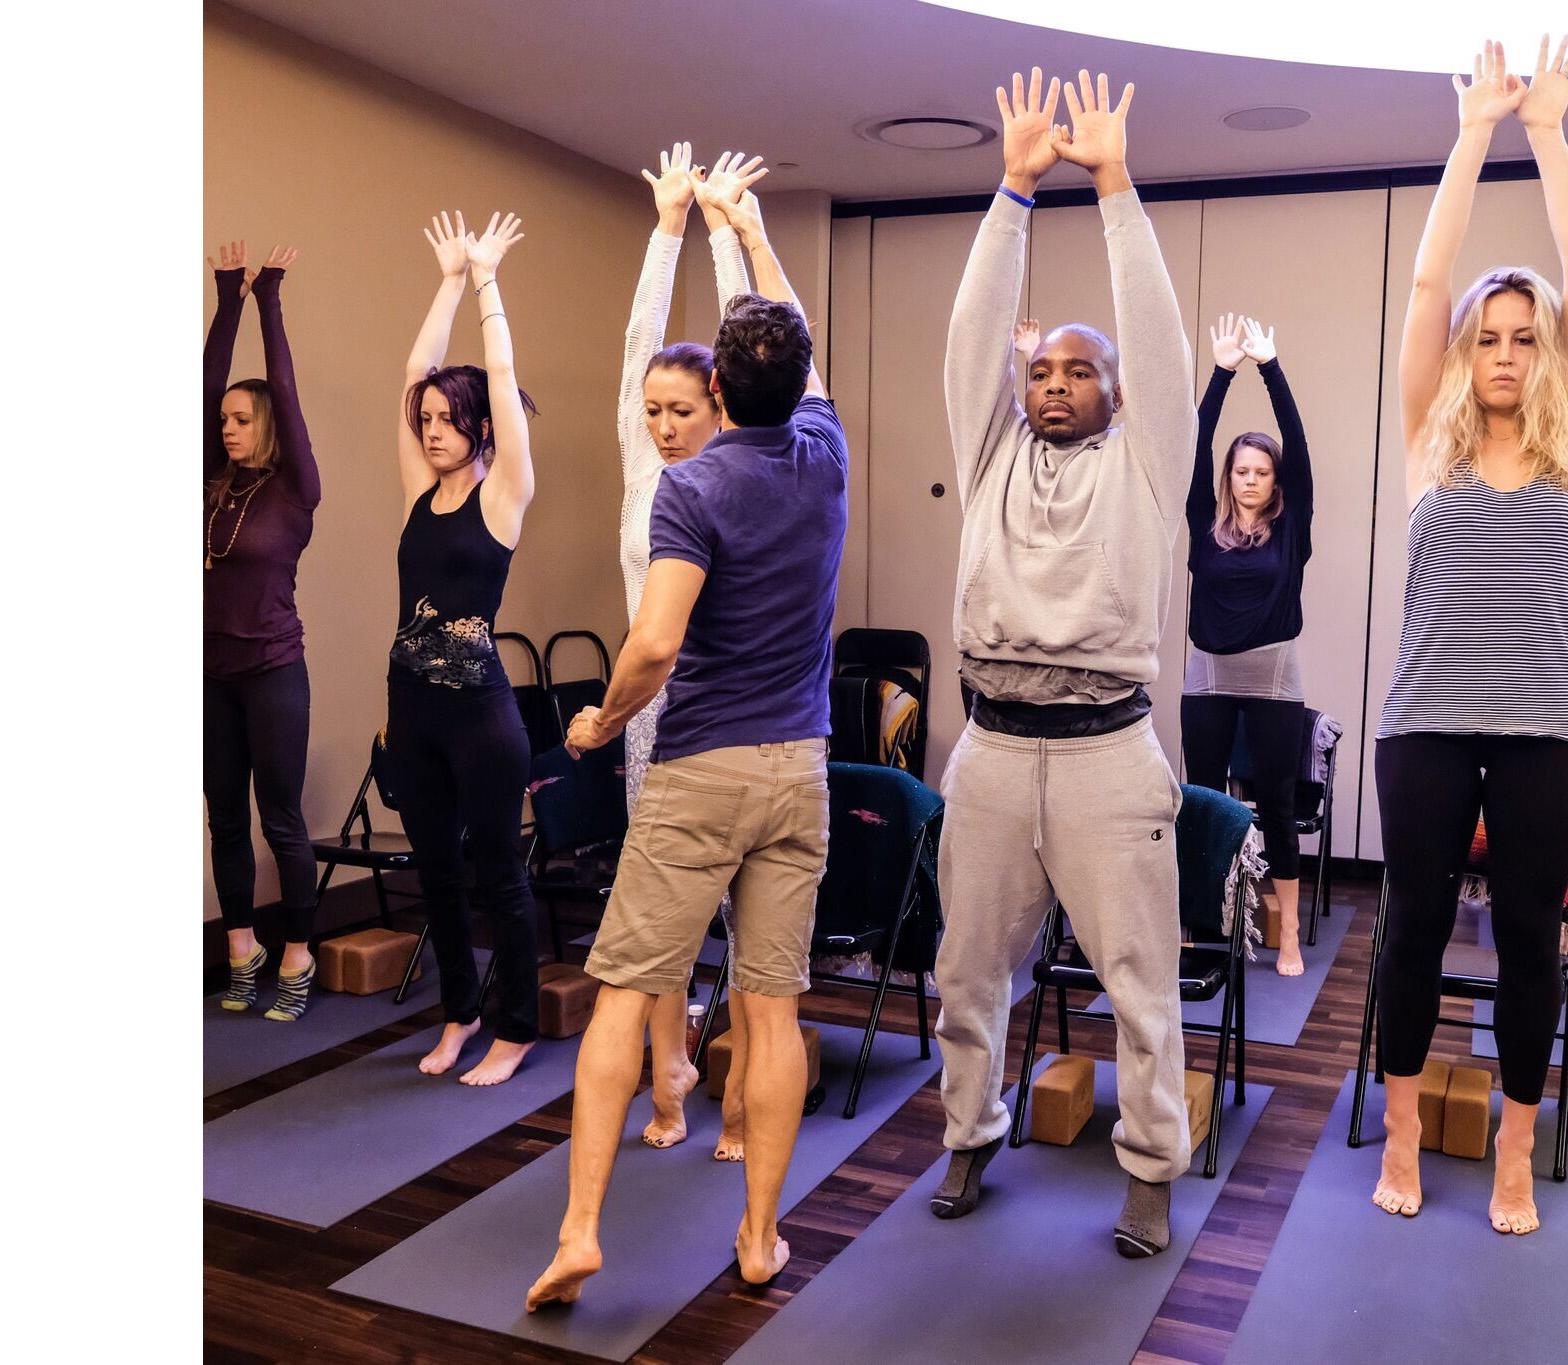 PYI_Prema_Yoga_Institute_testimonials_05b.jpg